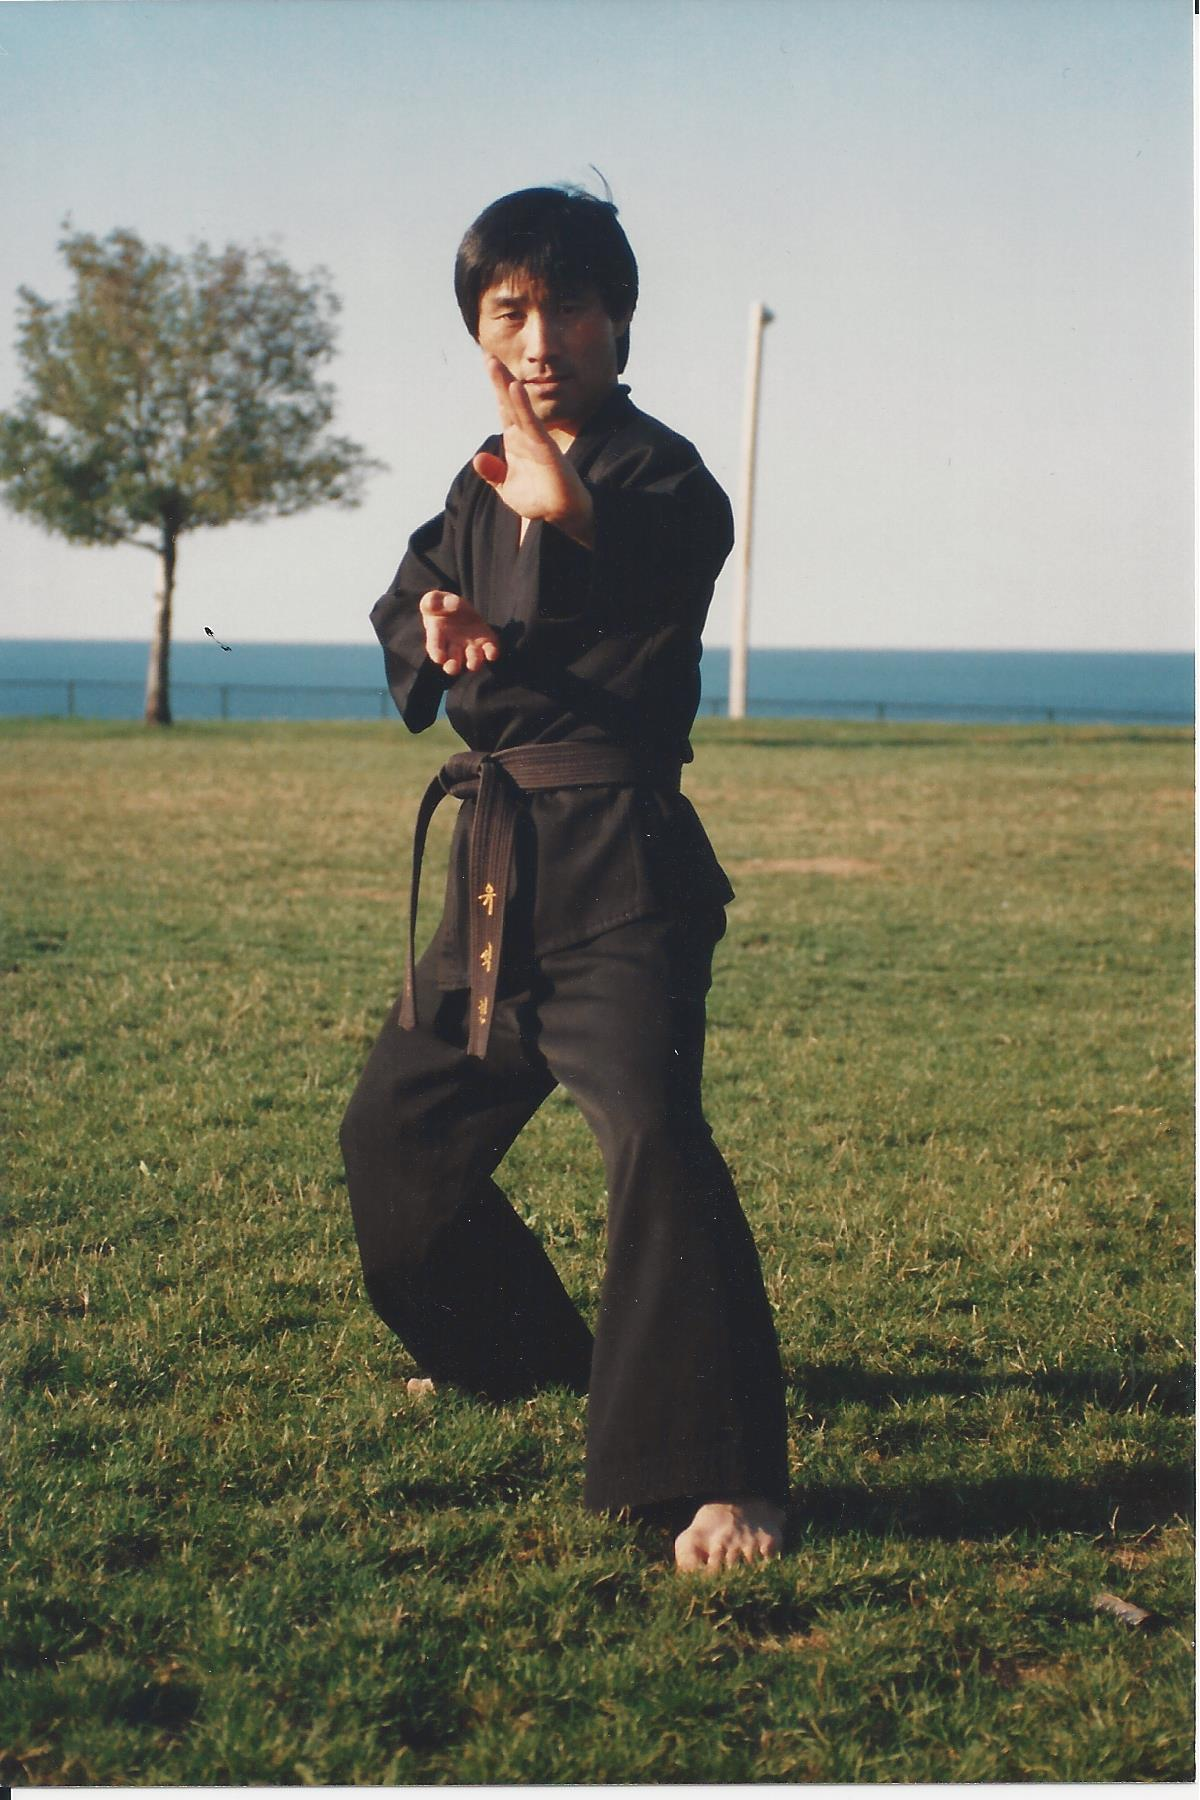 Sr. GrandMaster Yu